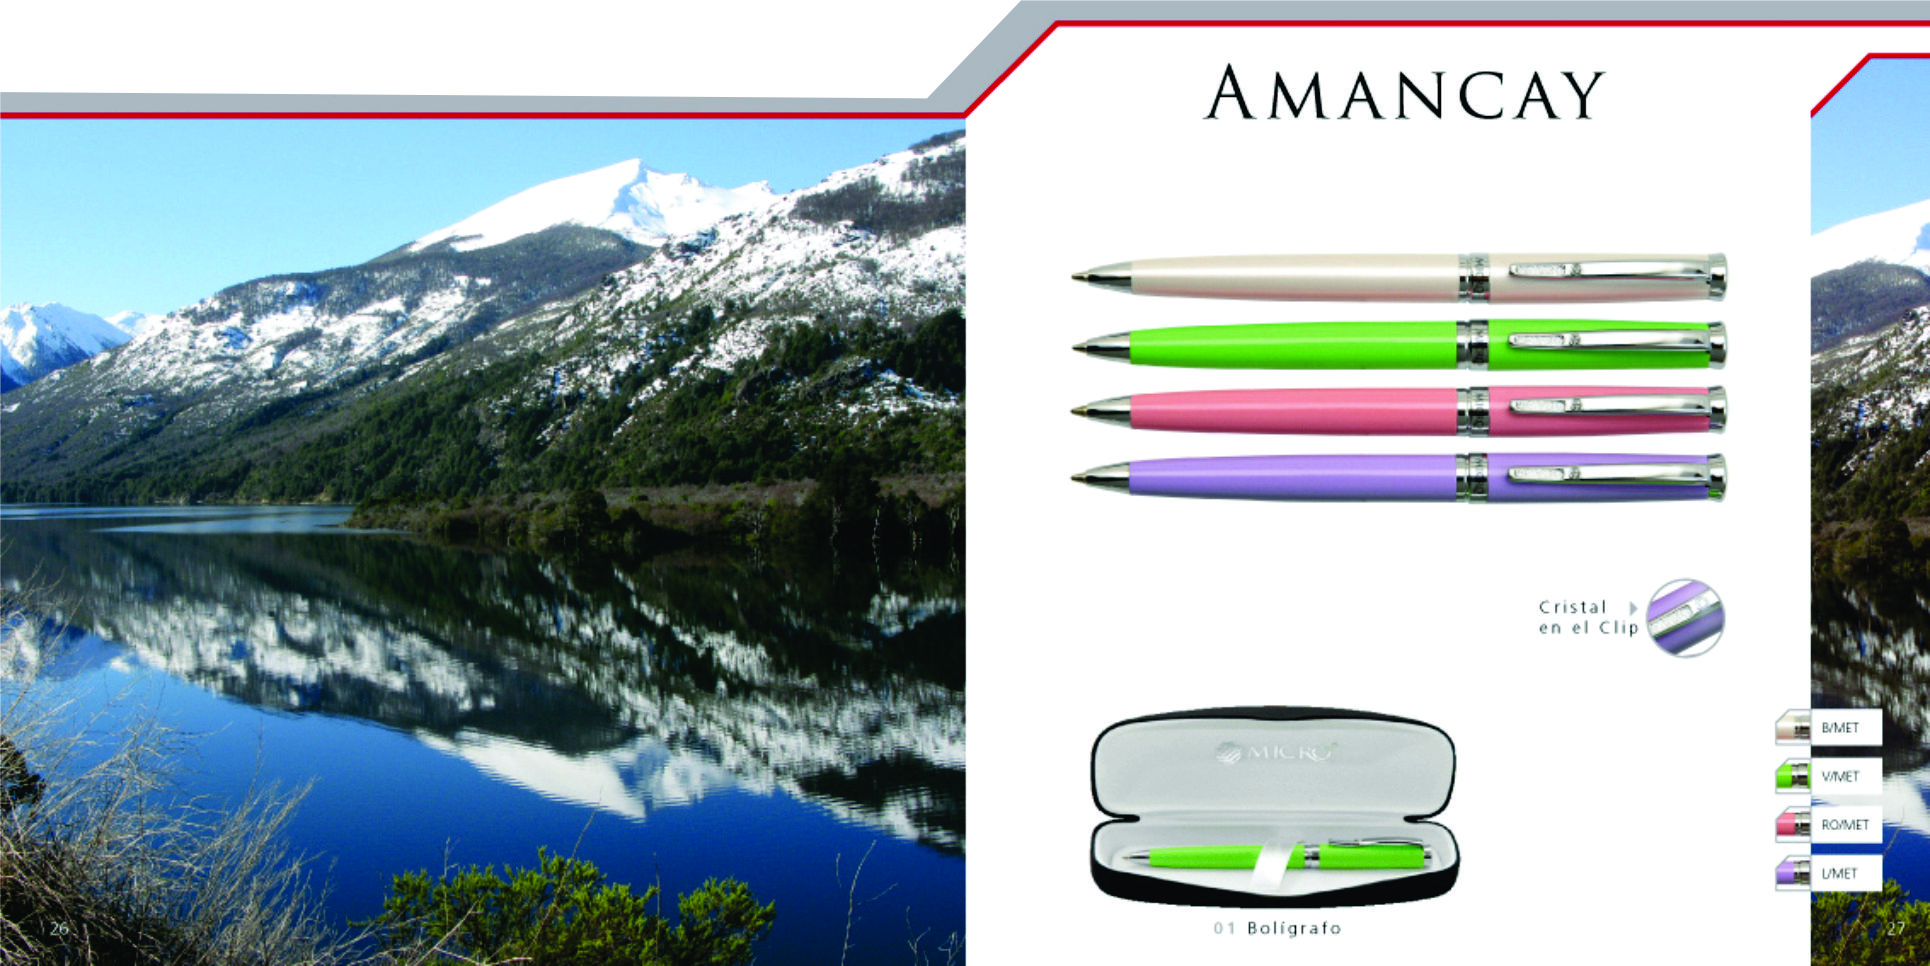 amancay